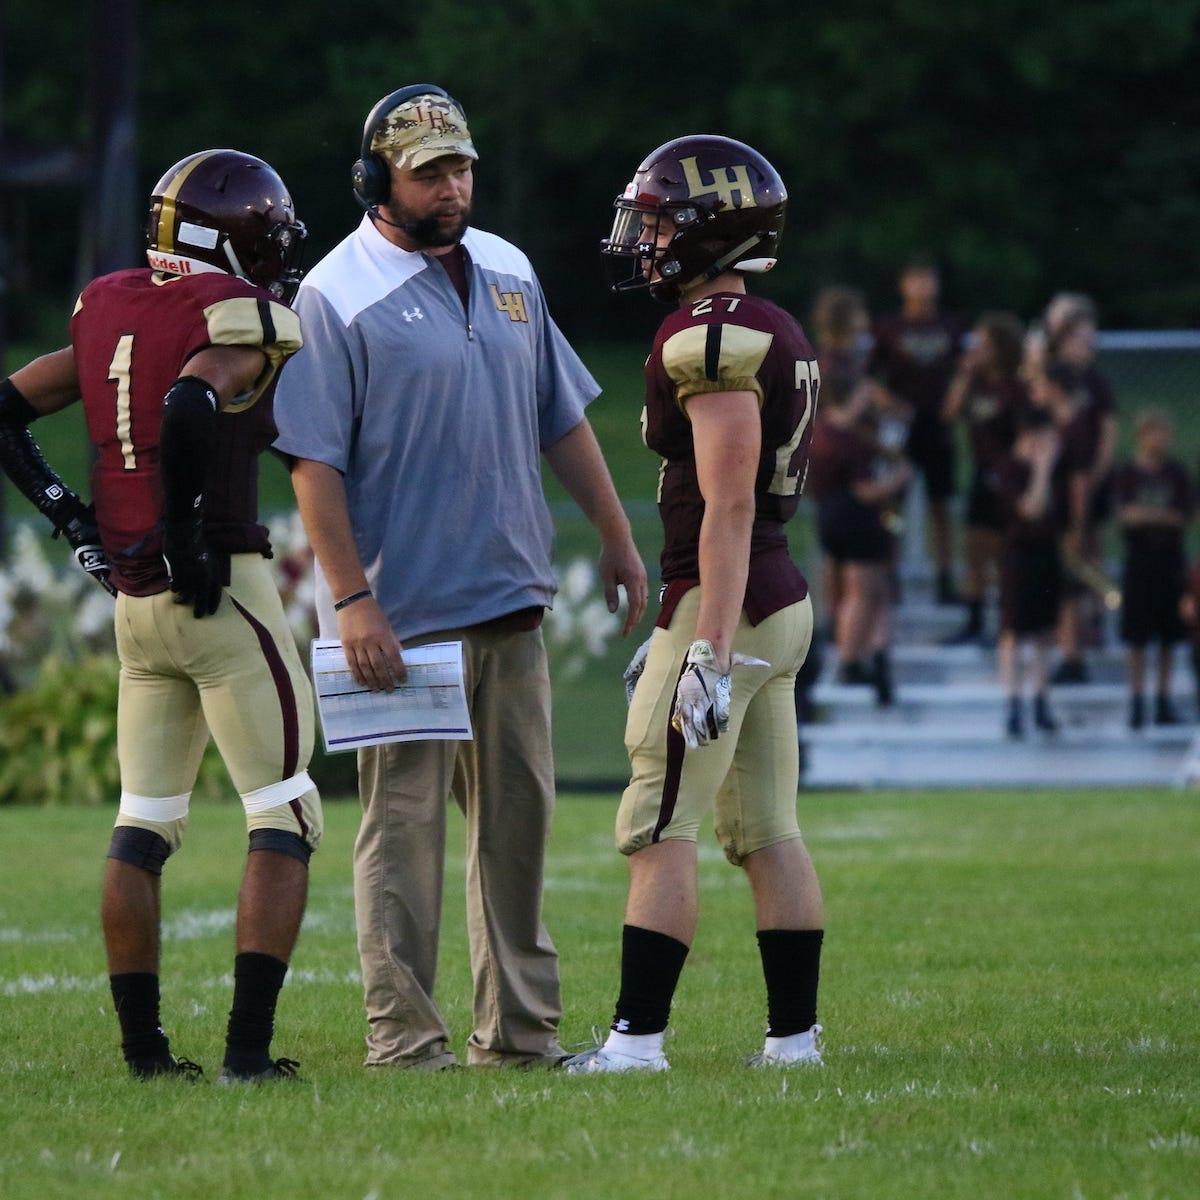 Waaland to be named Licking Heights football coach